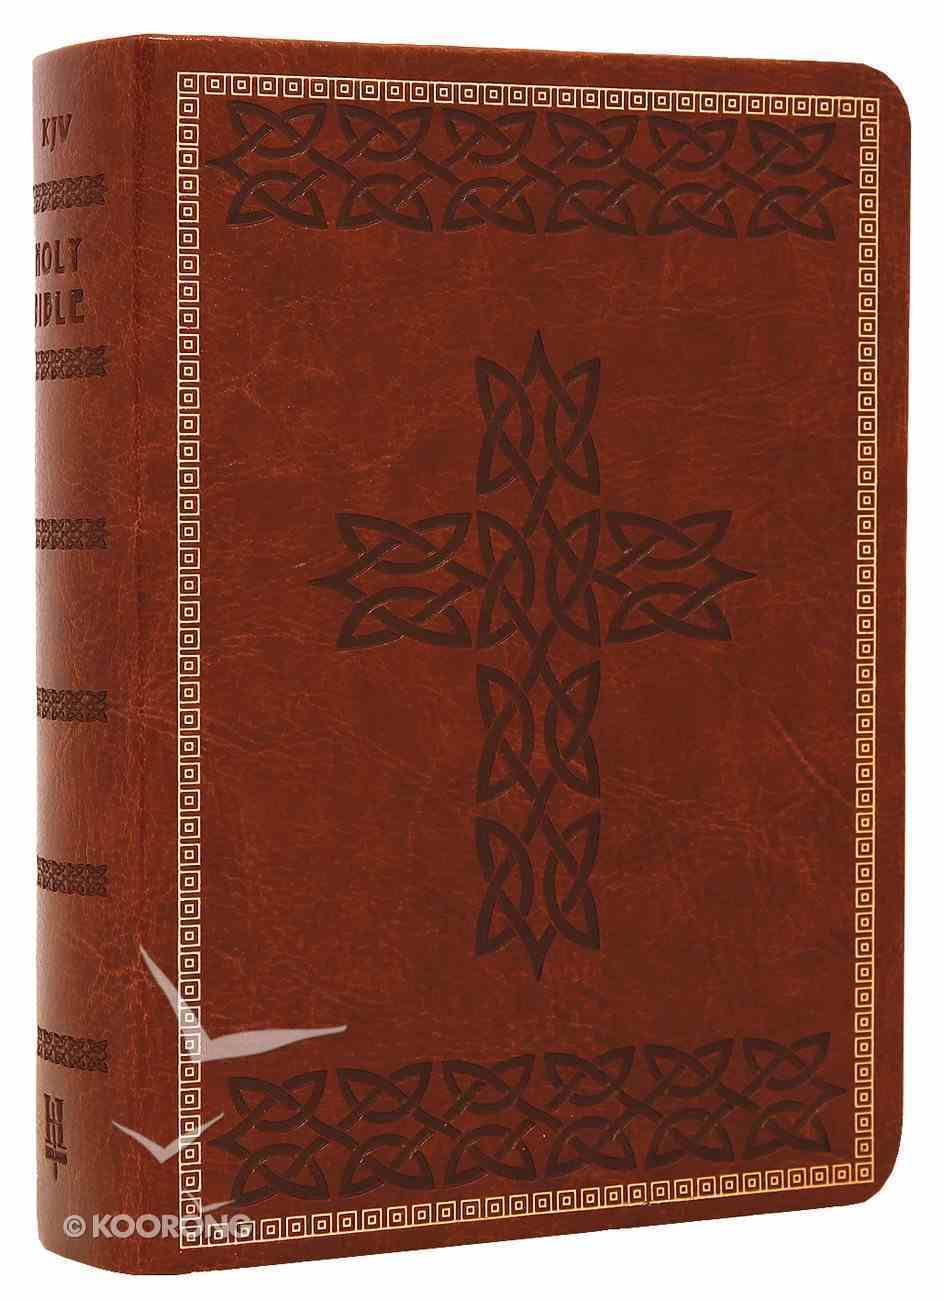 KJV Large Print Compact Reference Brown Premium Imitation Leather